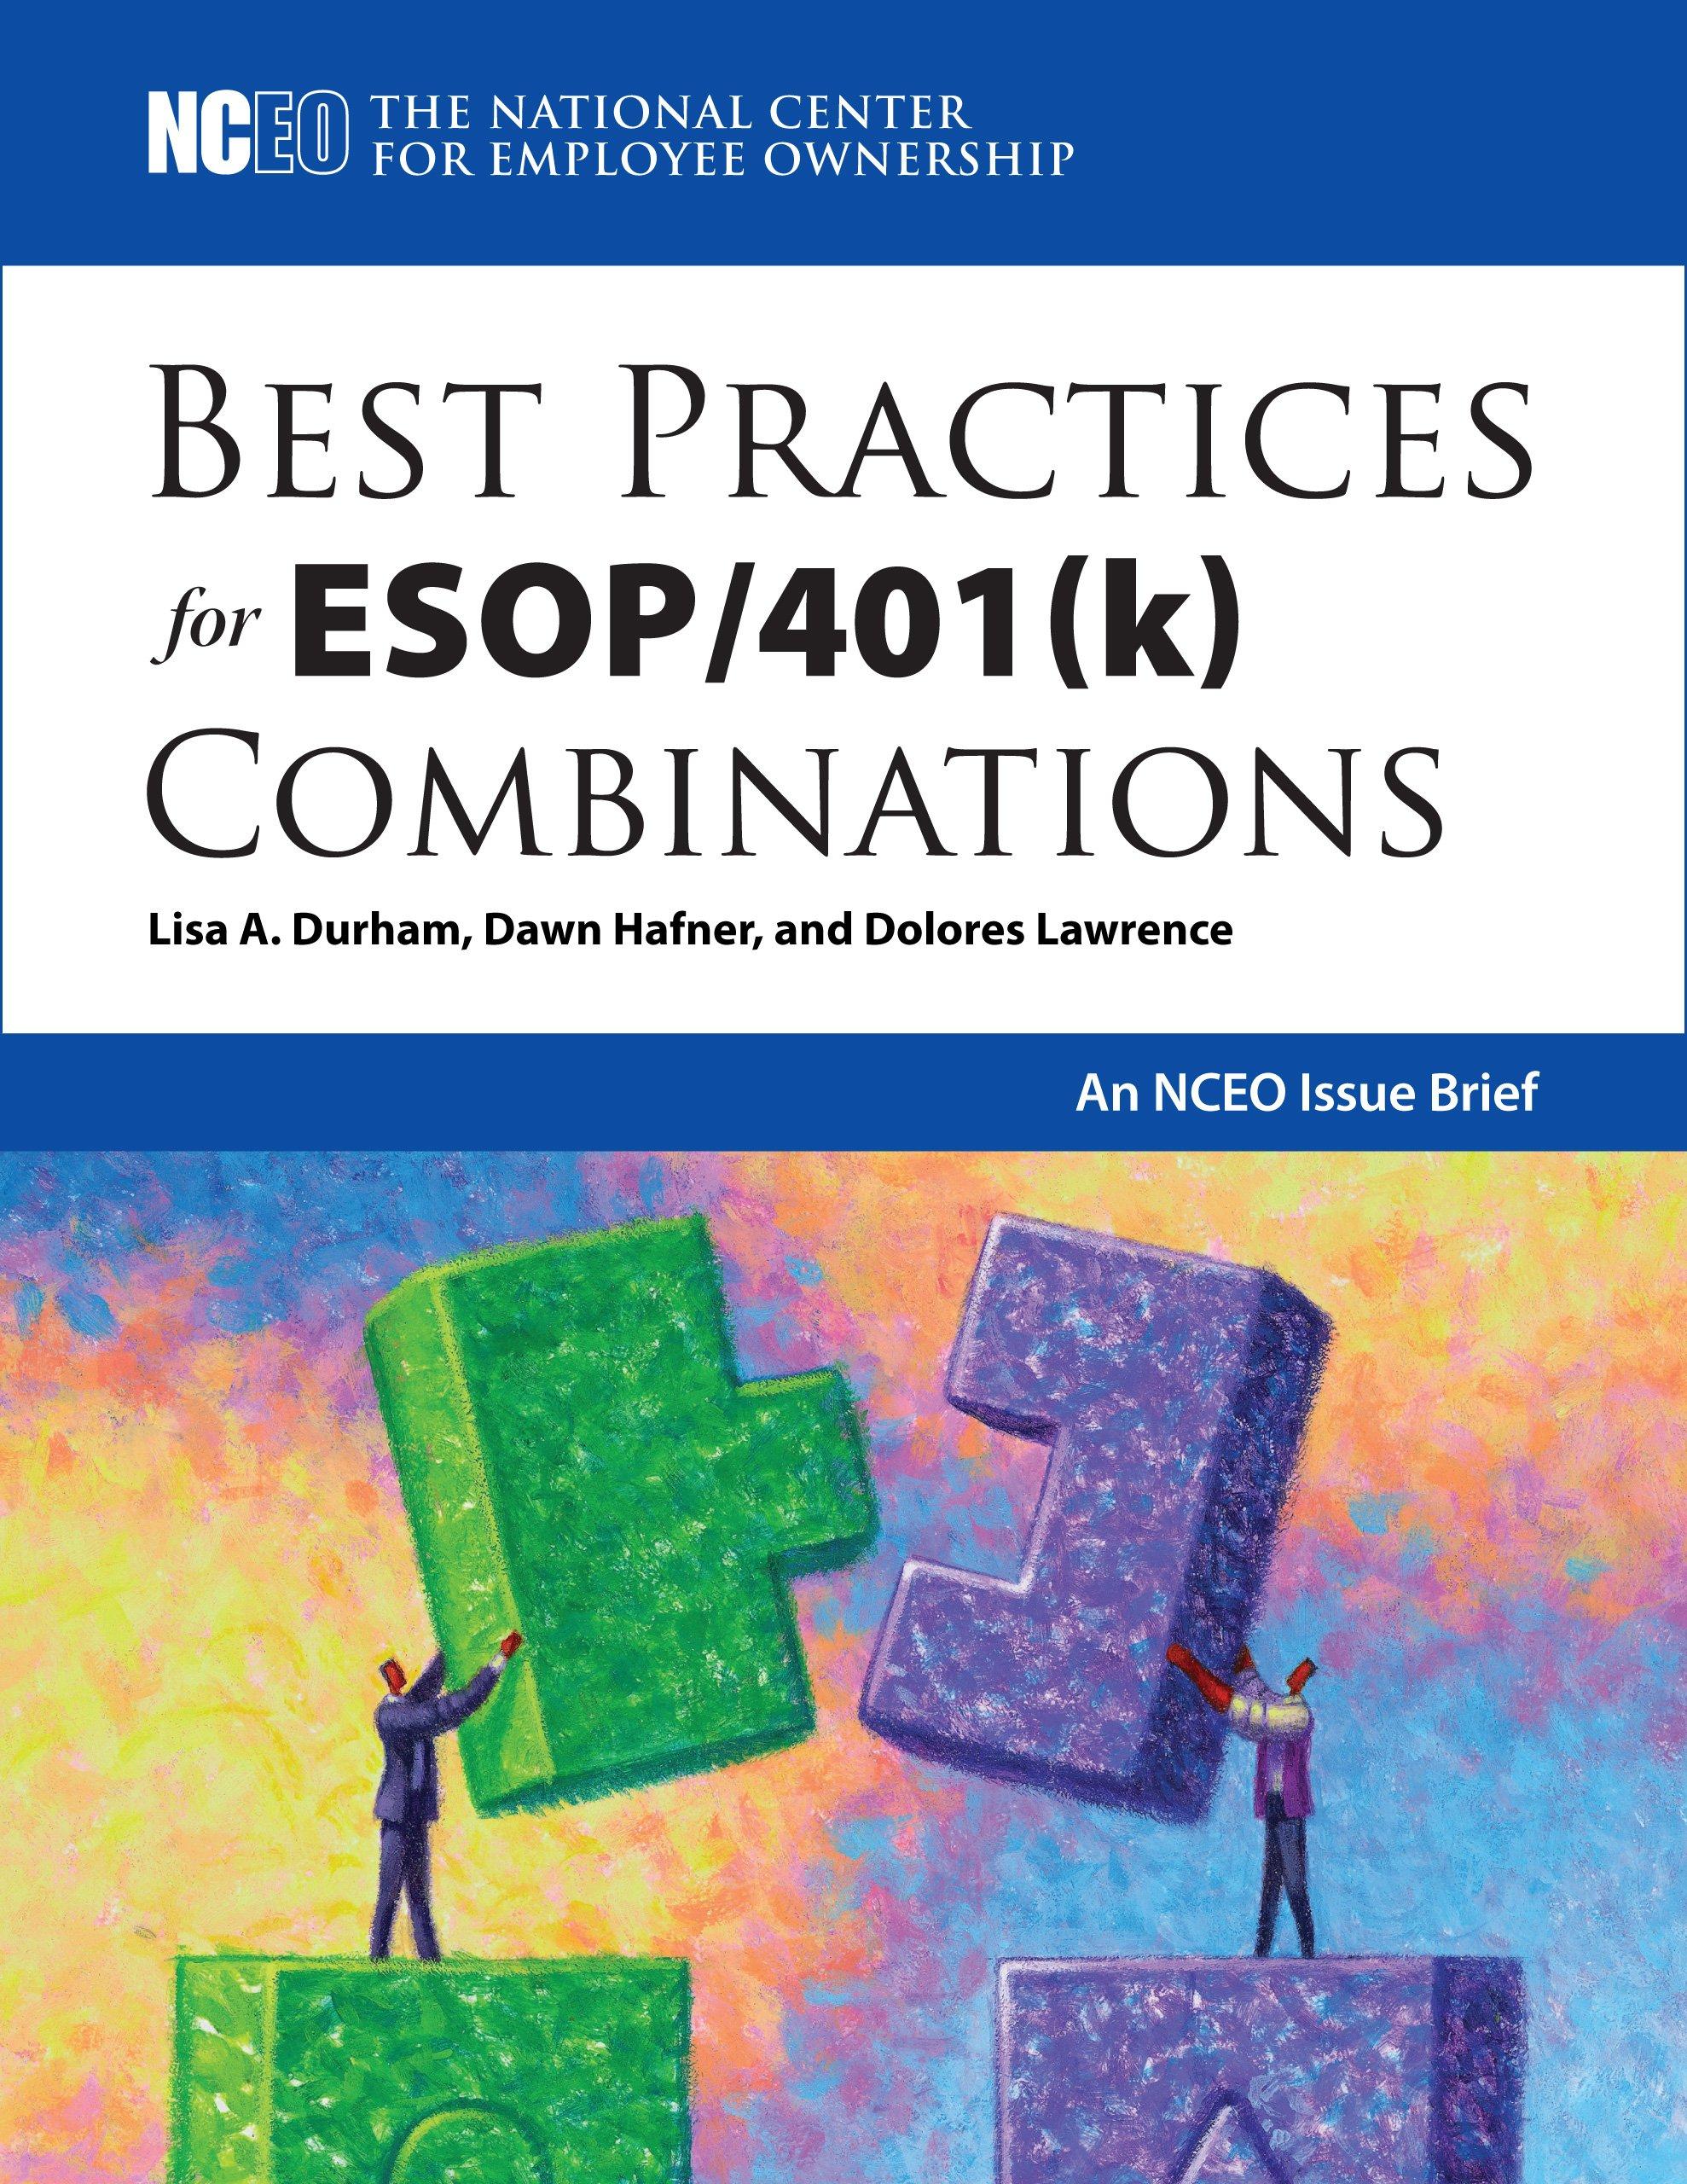 Best Practices for ESOP/401(k) Combinations